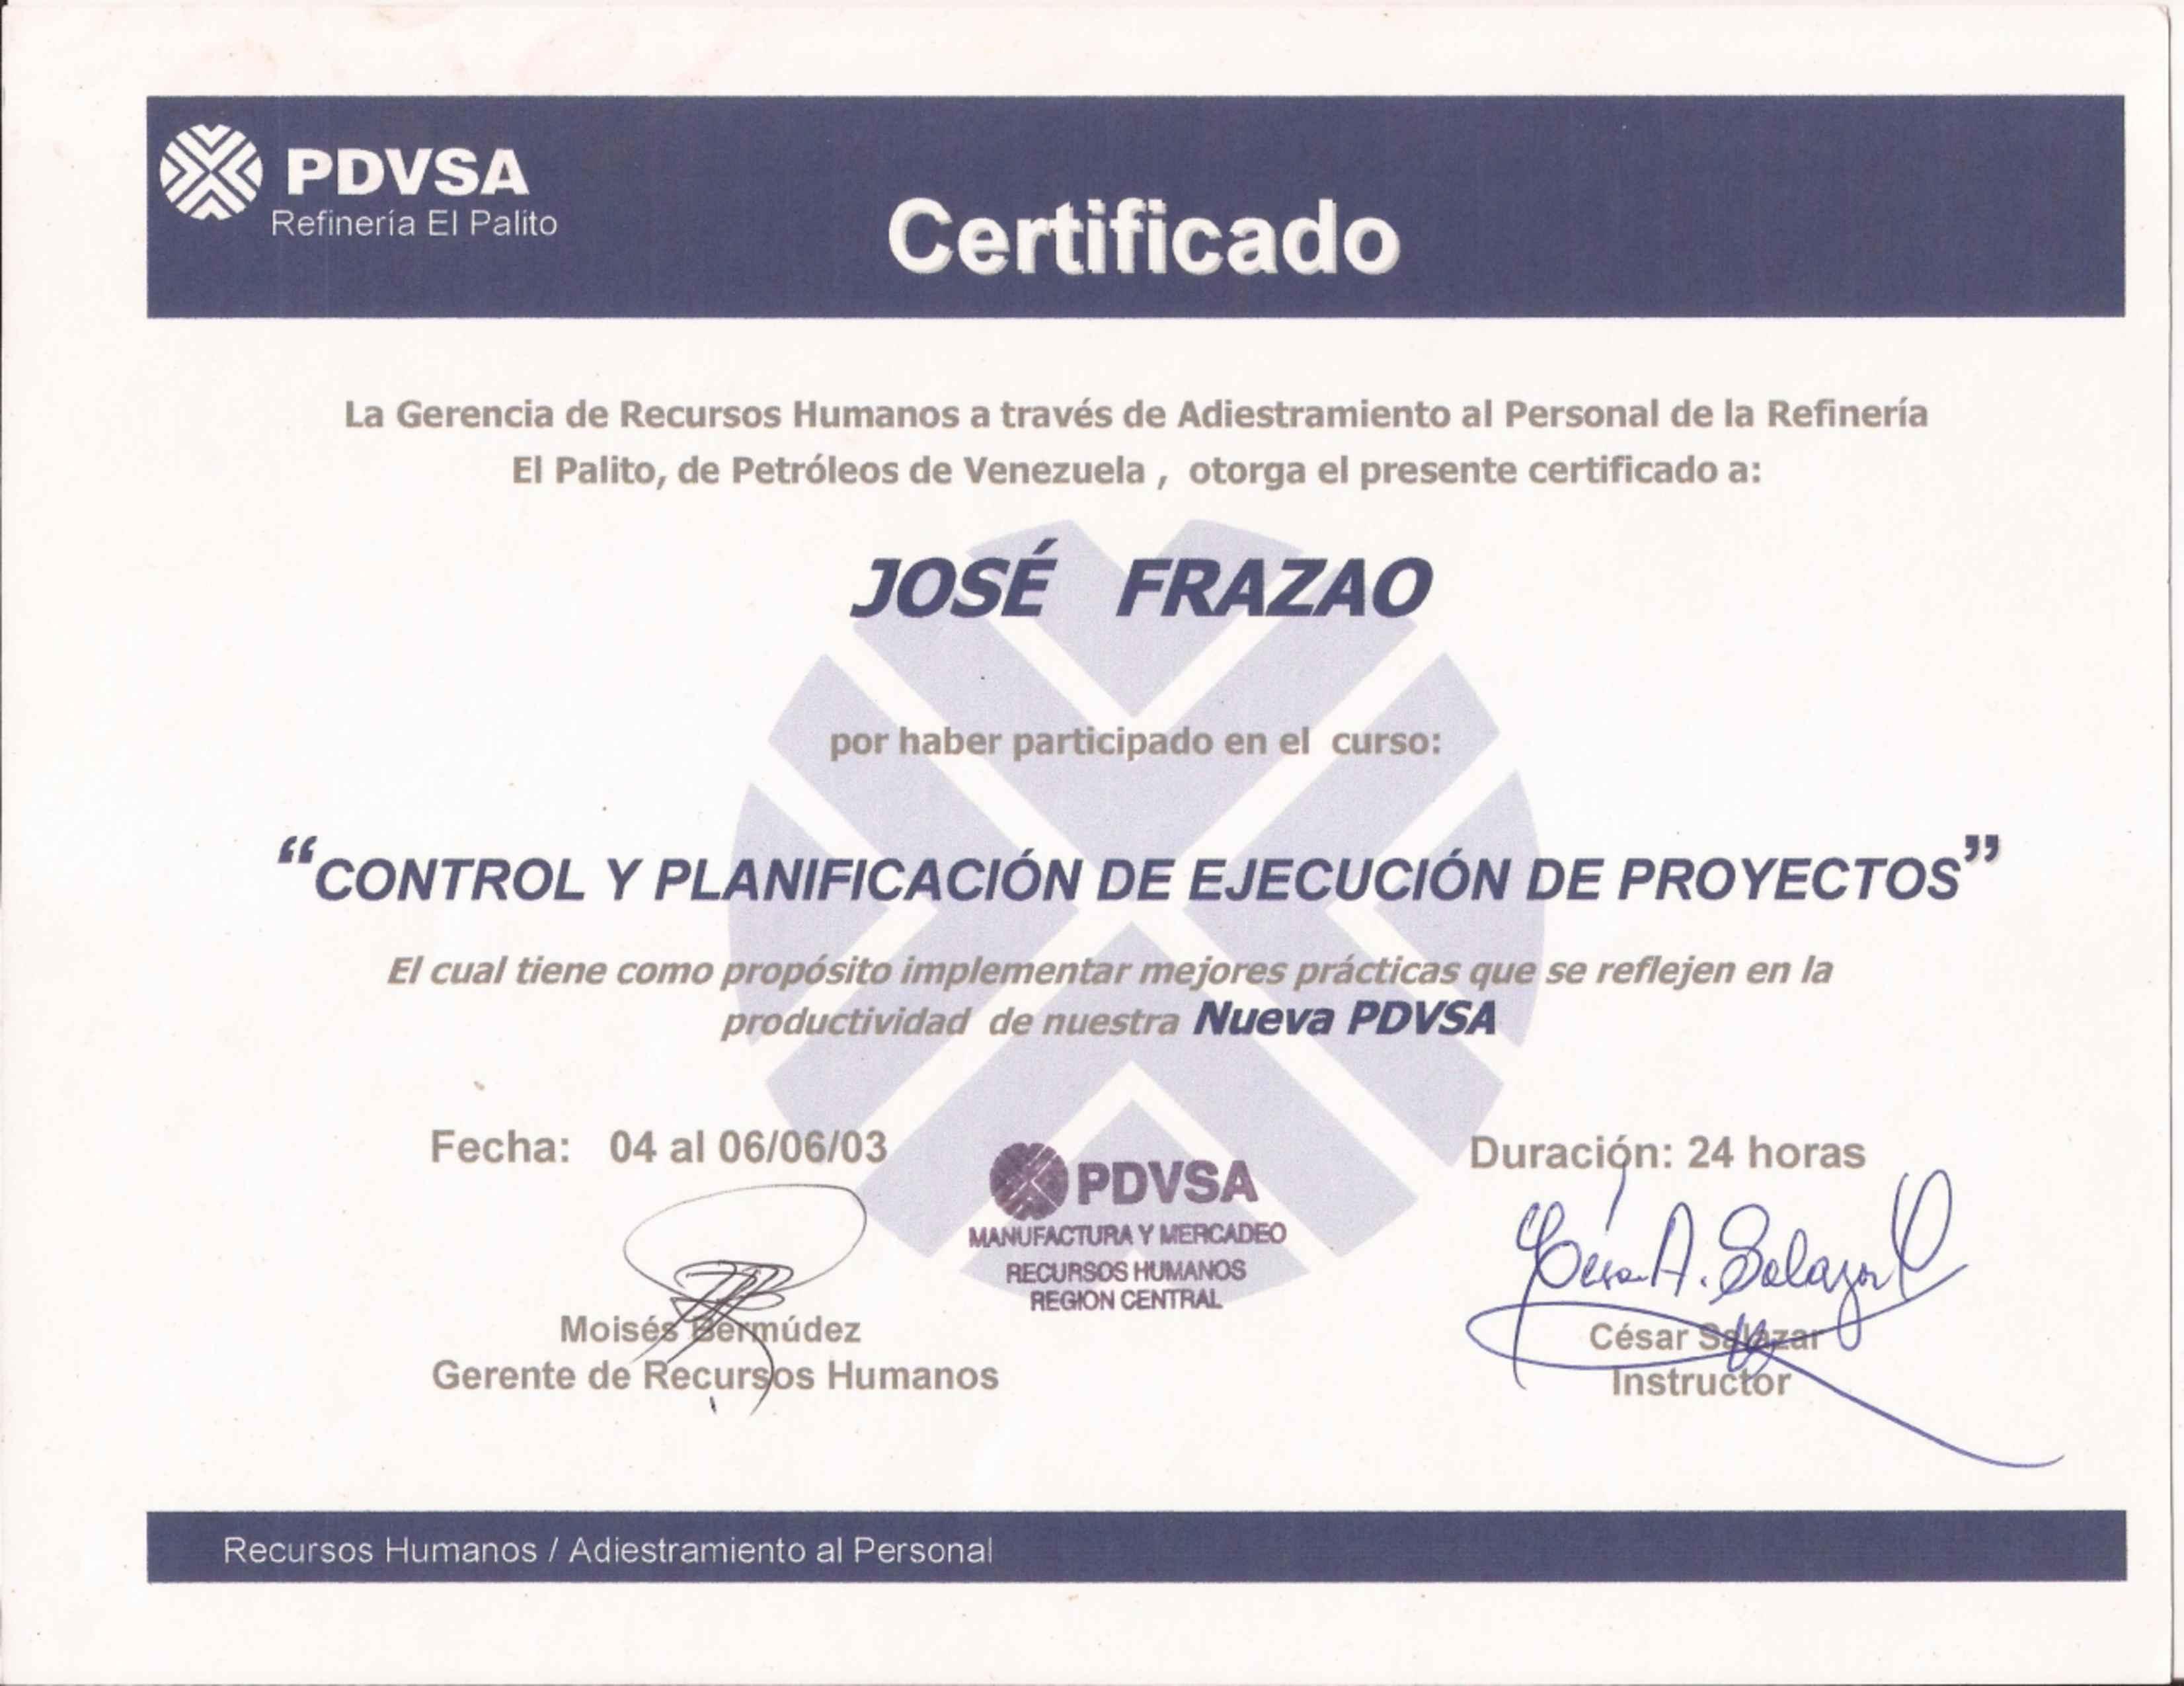 Jose frazao bayt training institute pdvsa training center 1betcityfo Gallery